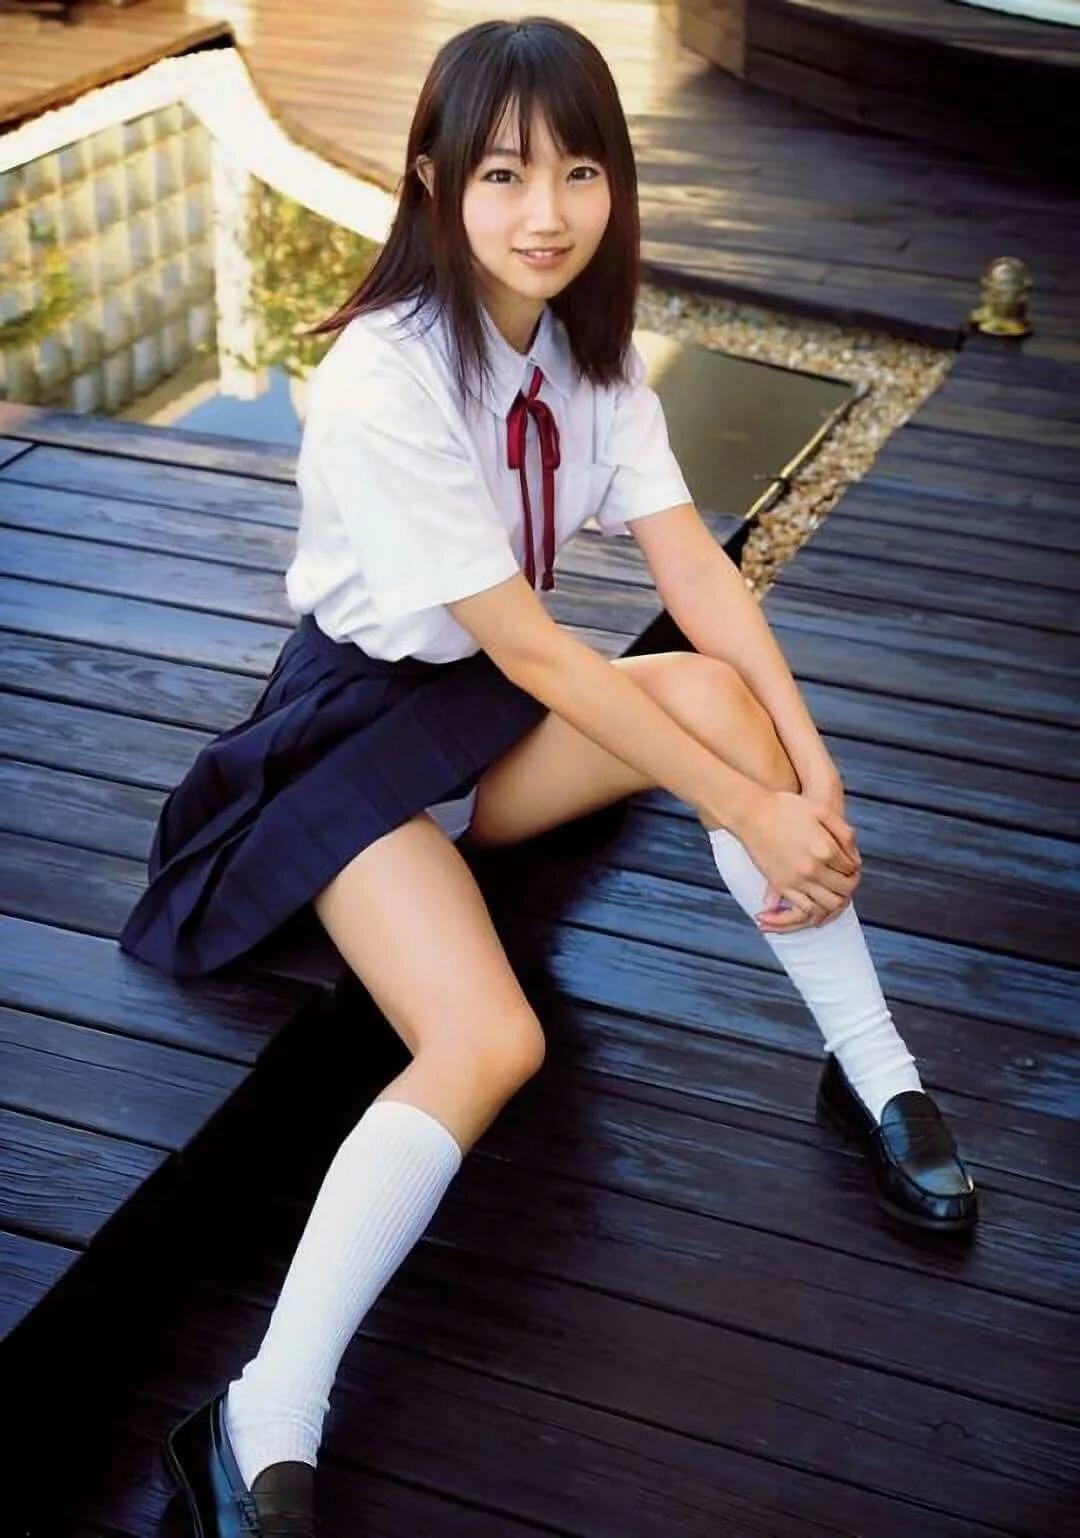 Japanese schoolgirl panty